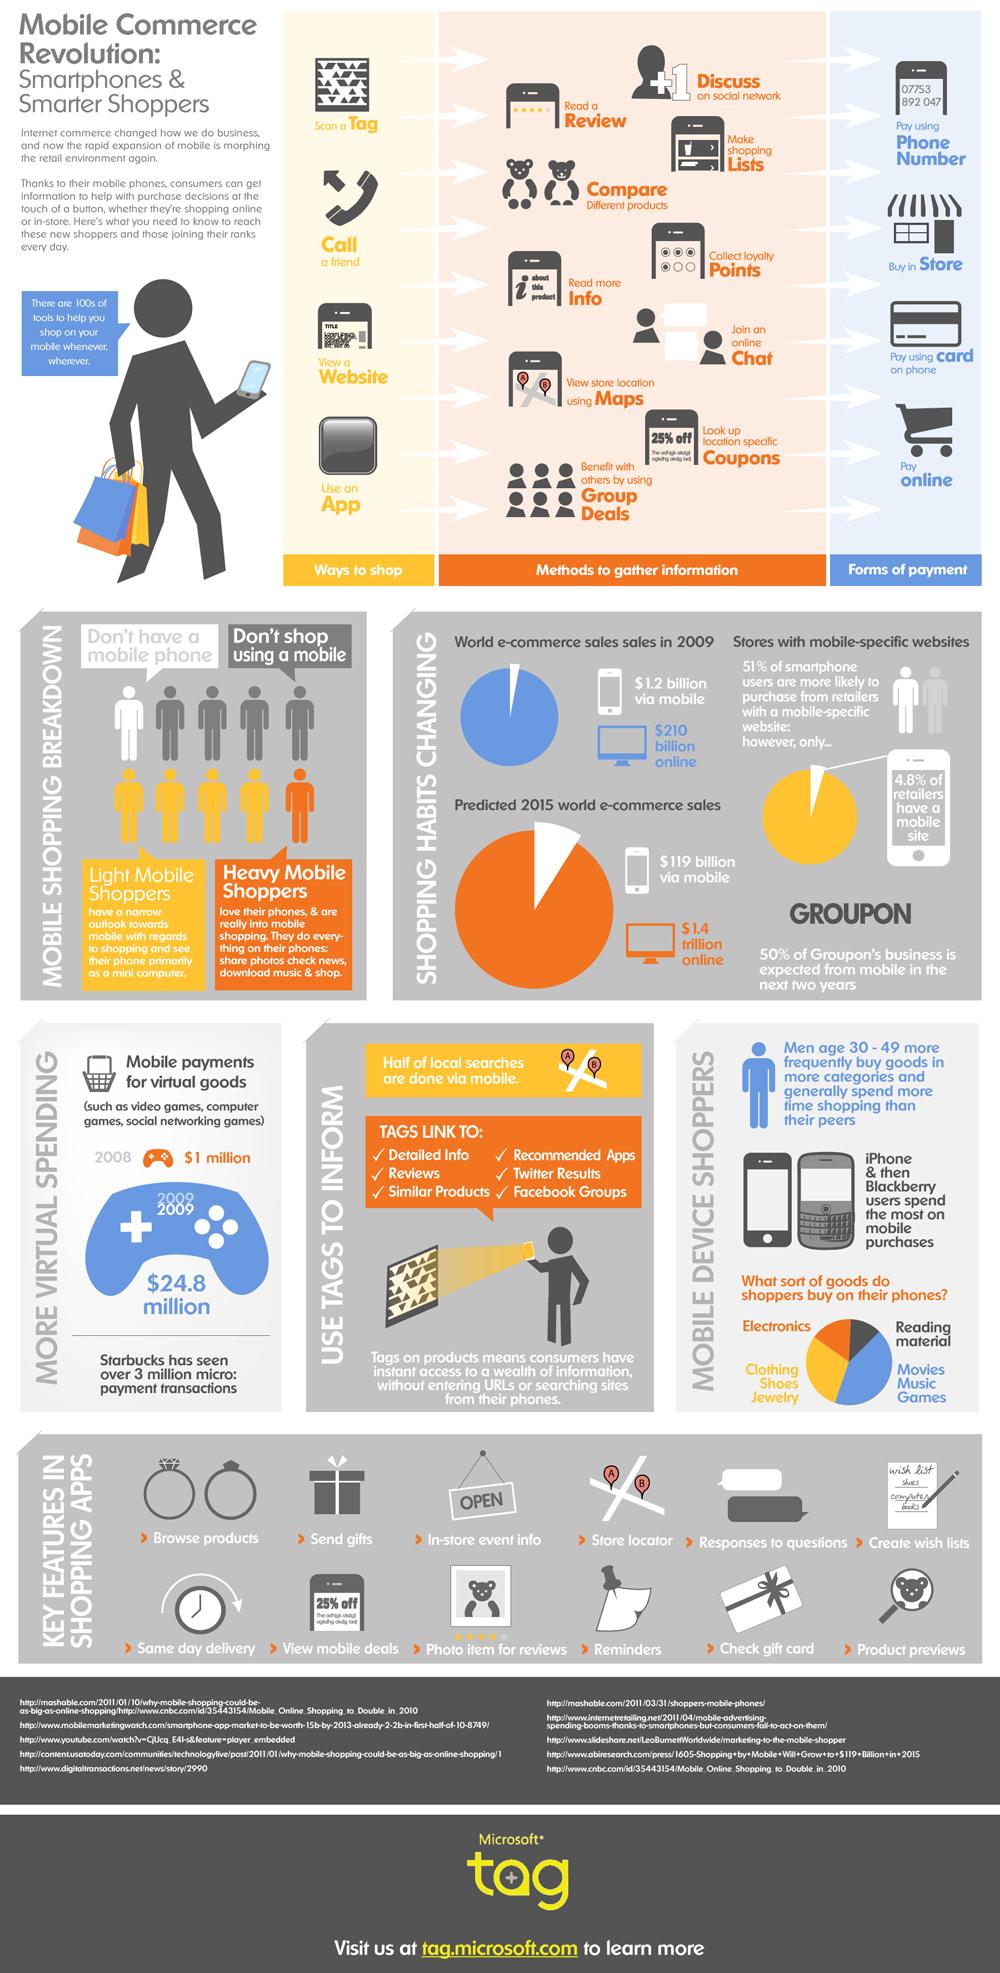 mobile-commerce-smartphone-shoppers(该图并非研究报告,仅作参考)